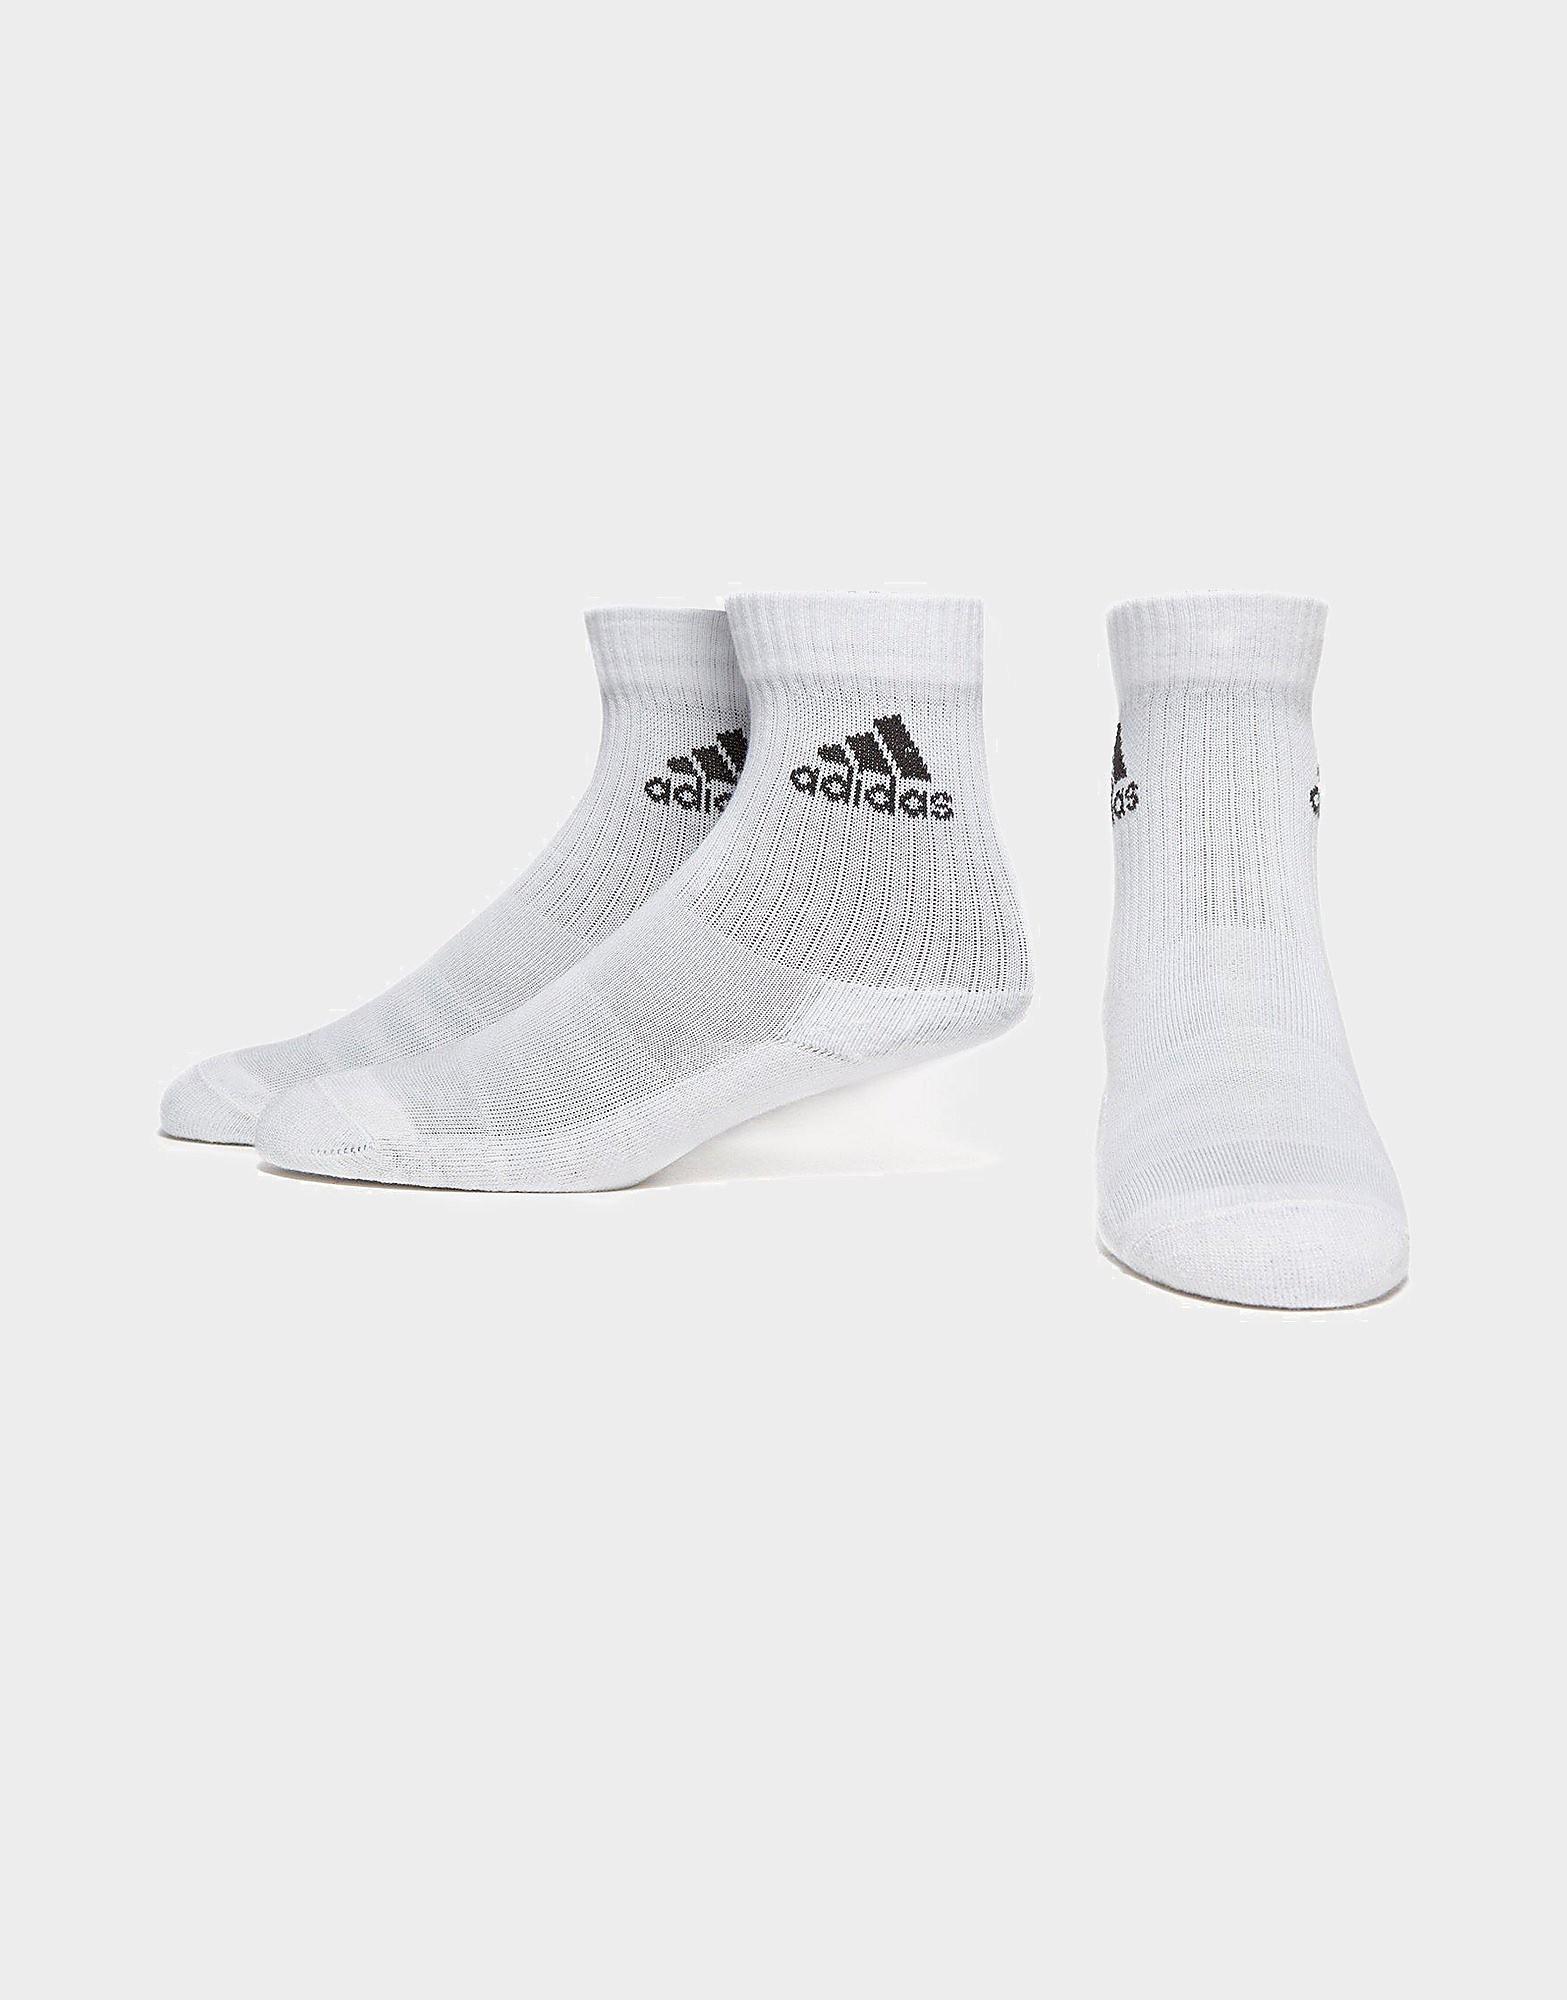 adidas 3-Stripes Performance Crew 3 Pack Socks